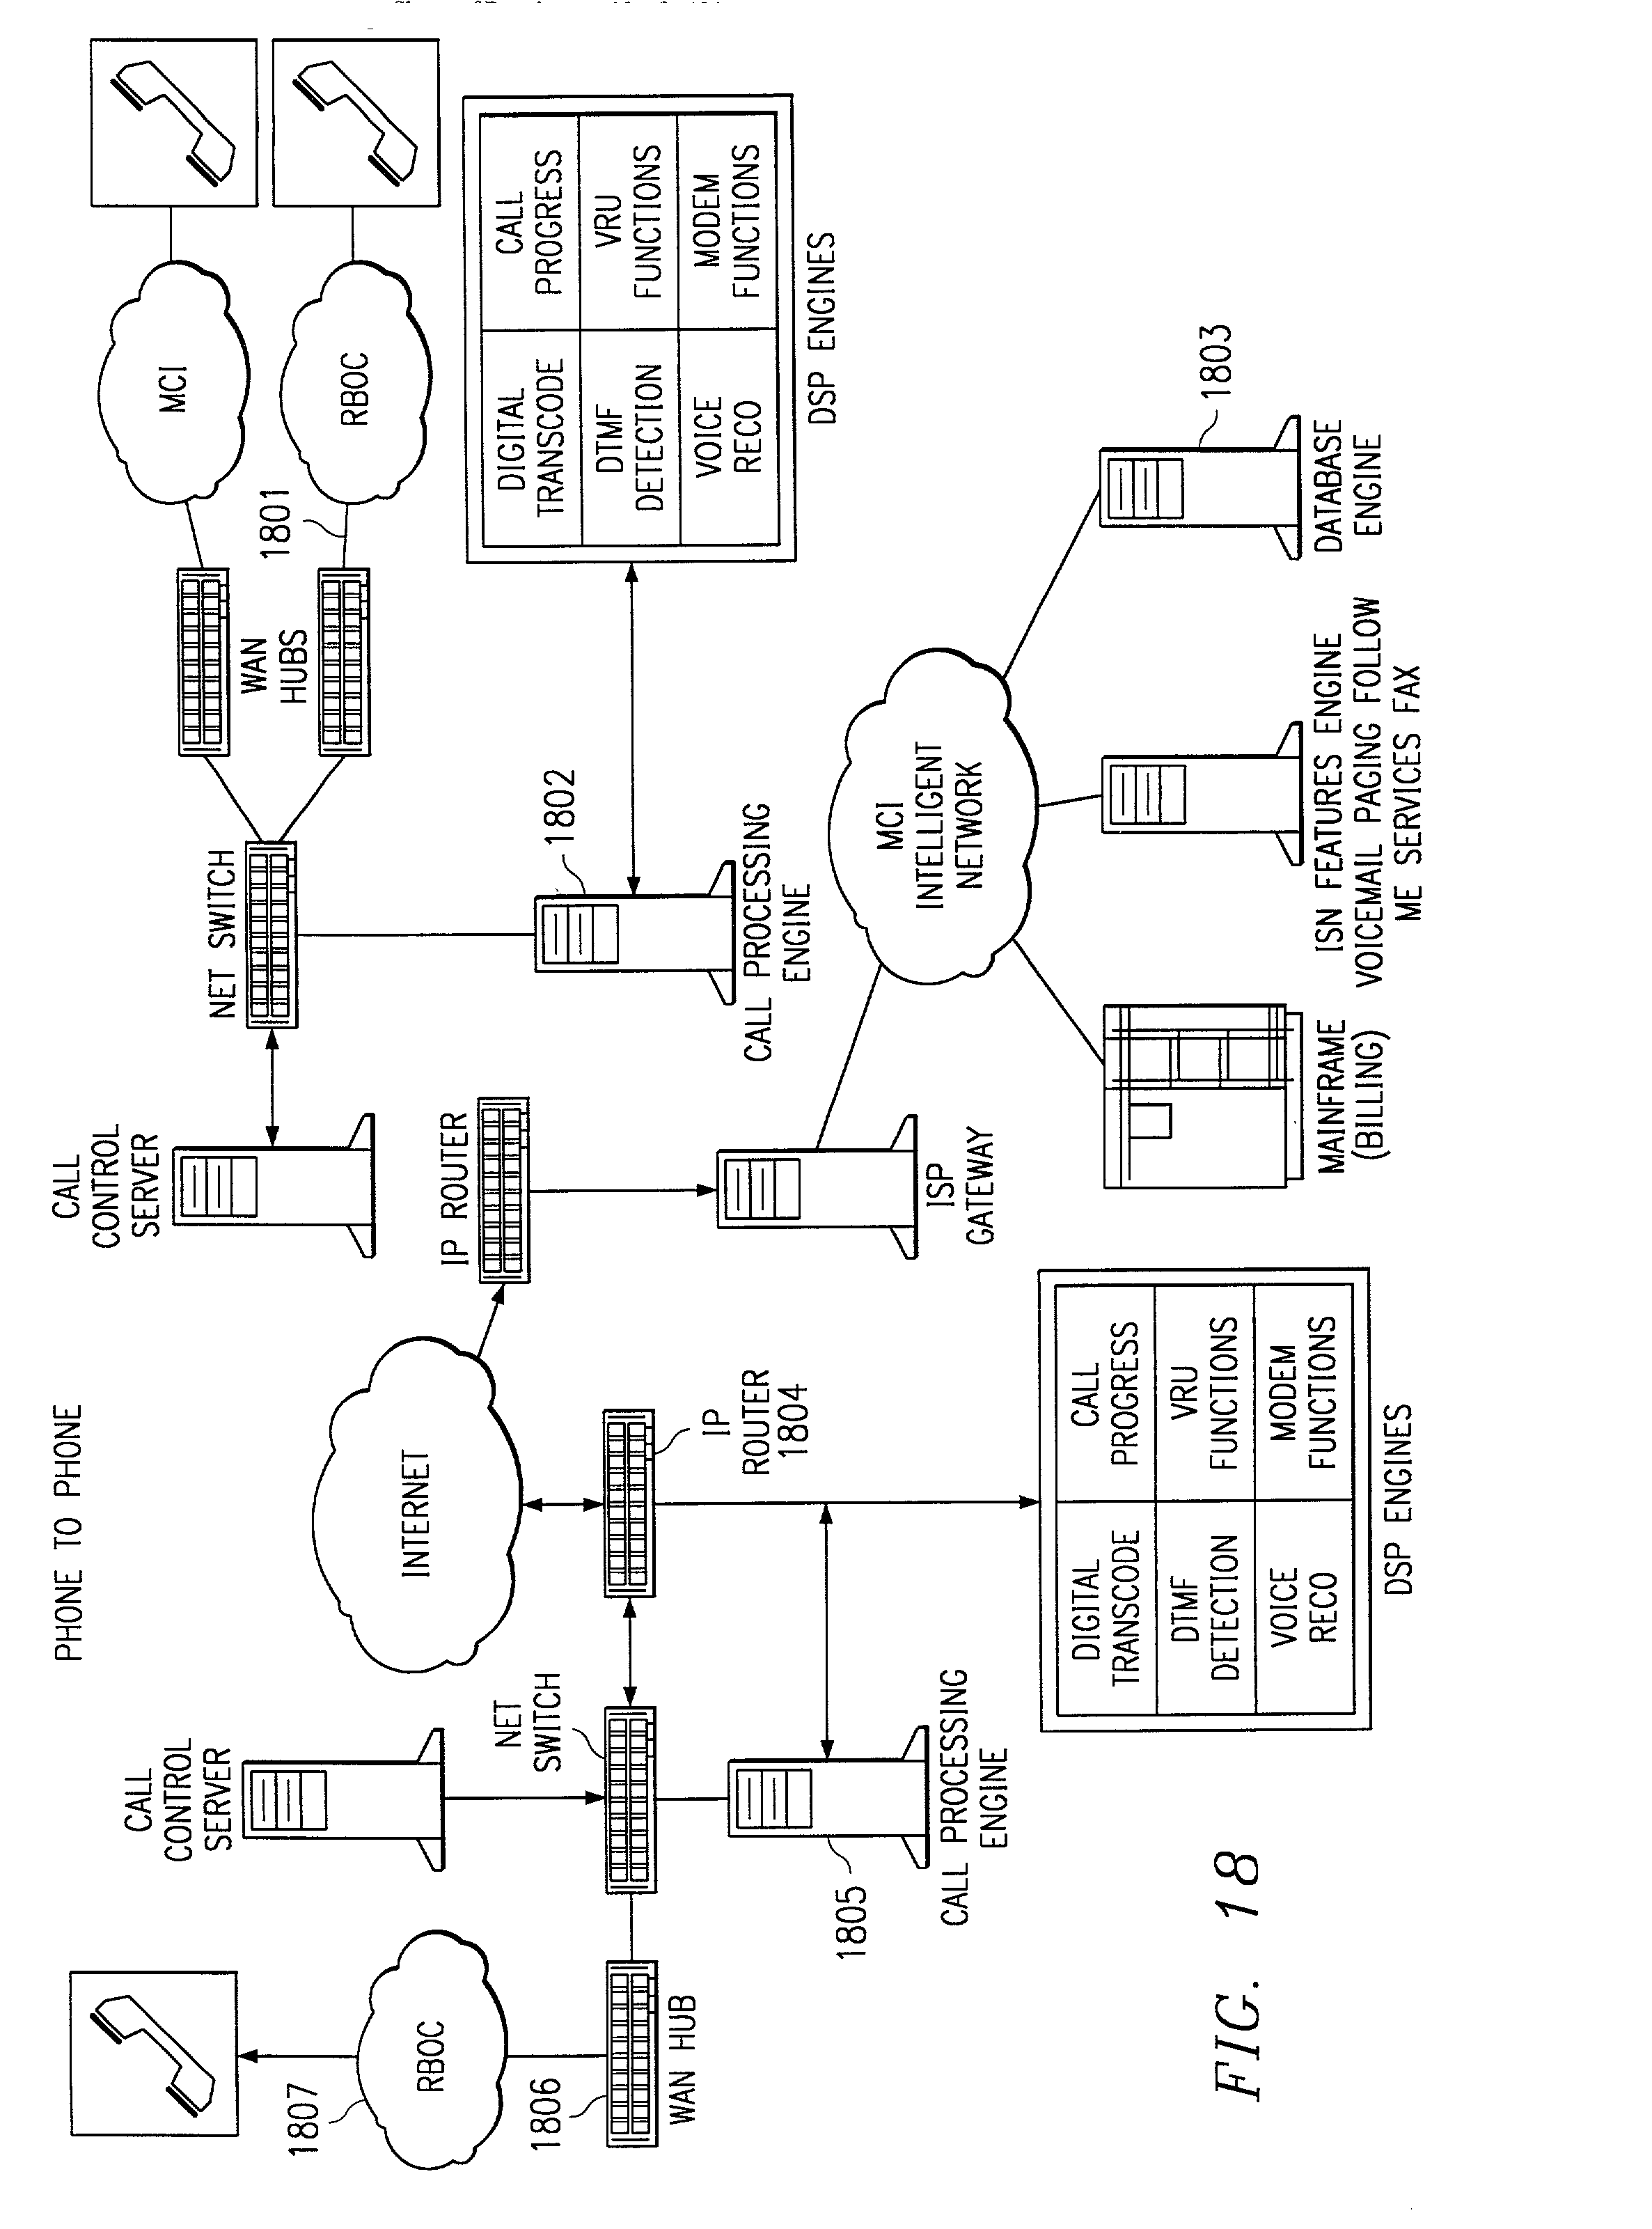 2301 honda h engine diagram patent us 20020064149a1  patent us 20020064149a1